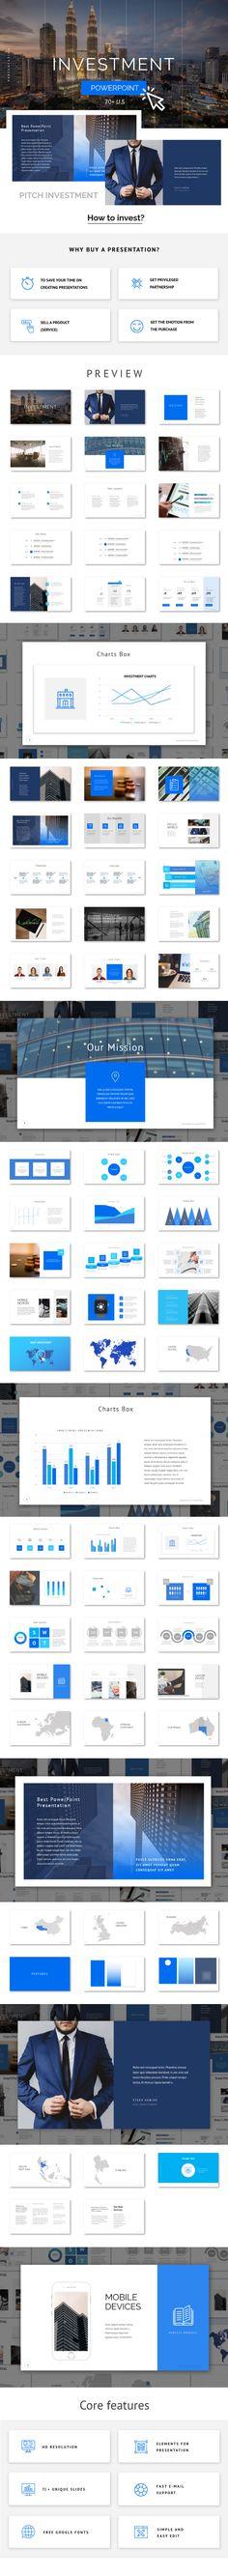 Investment - PowerPoint Presentation (PowerPoint Templates)